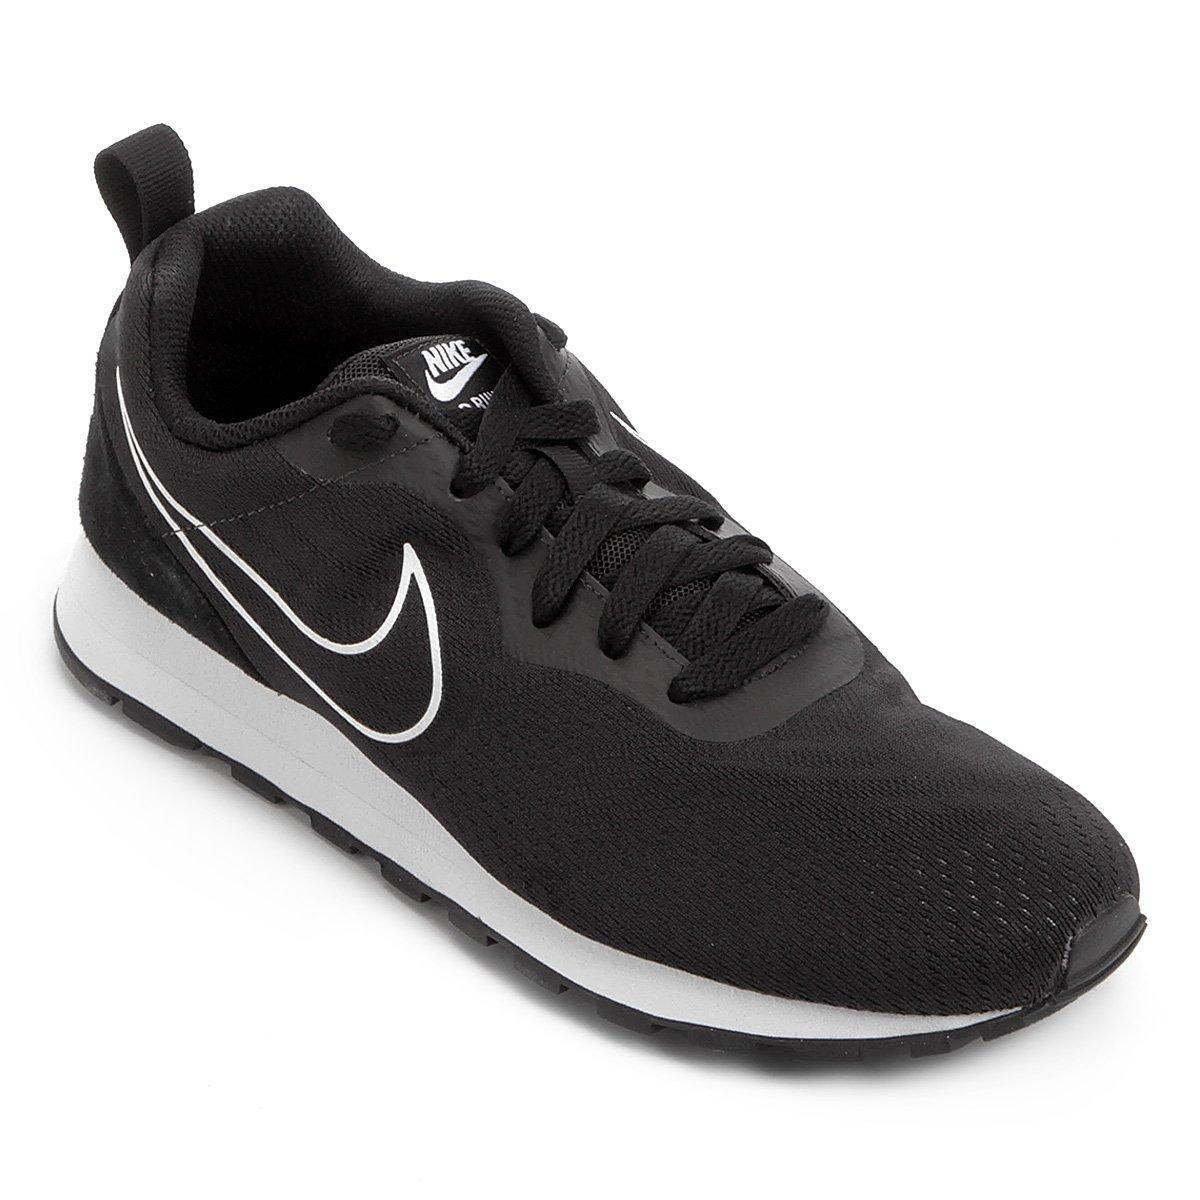 8938411a91 Tênis Nike Md Runner 2 Eng Mesh Masculino - Compre Agora